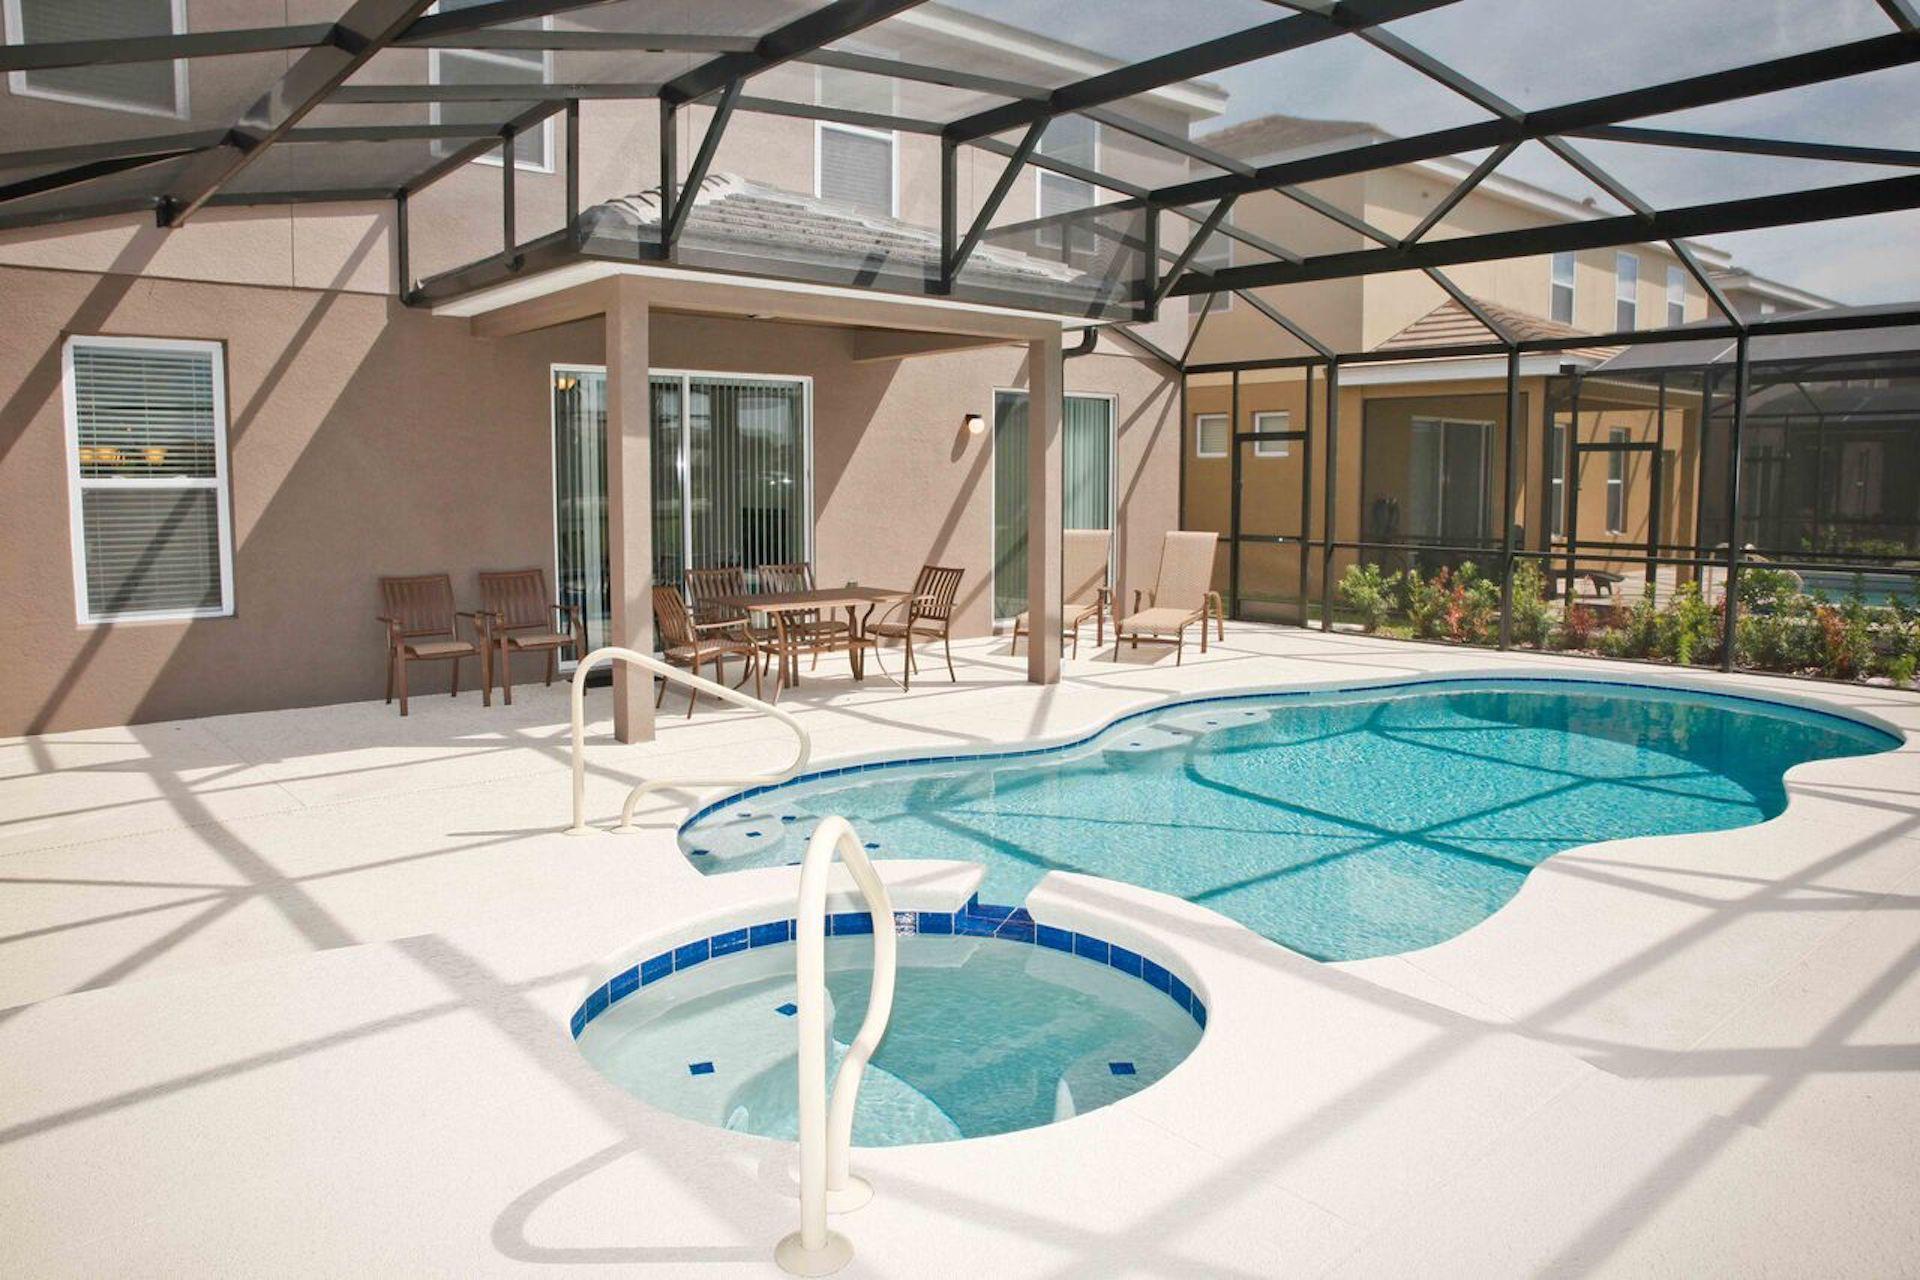 Luxury Design Home Disney Pool SPA 6BR  5 BA